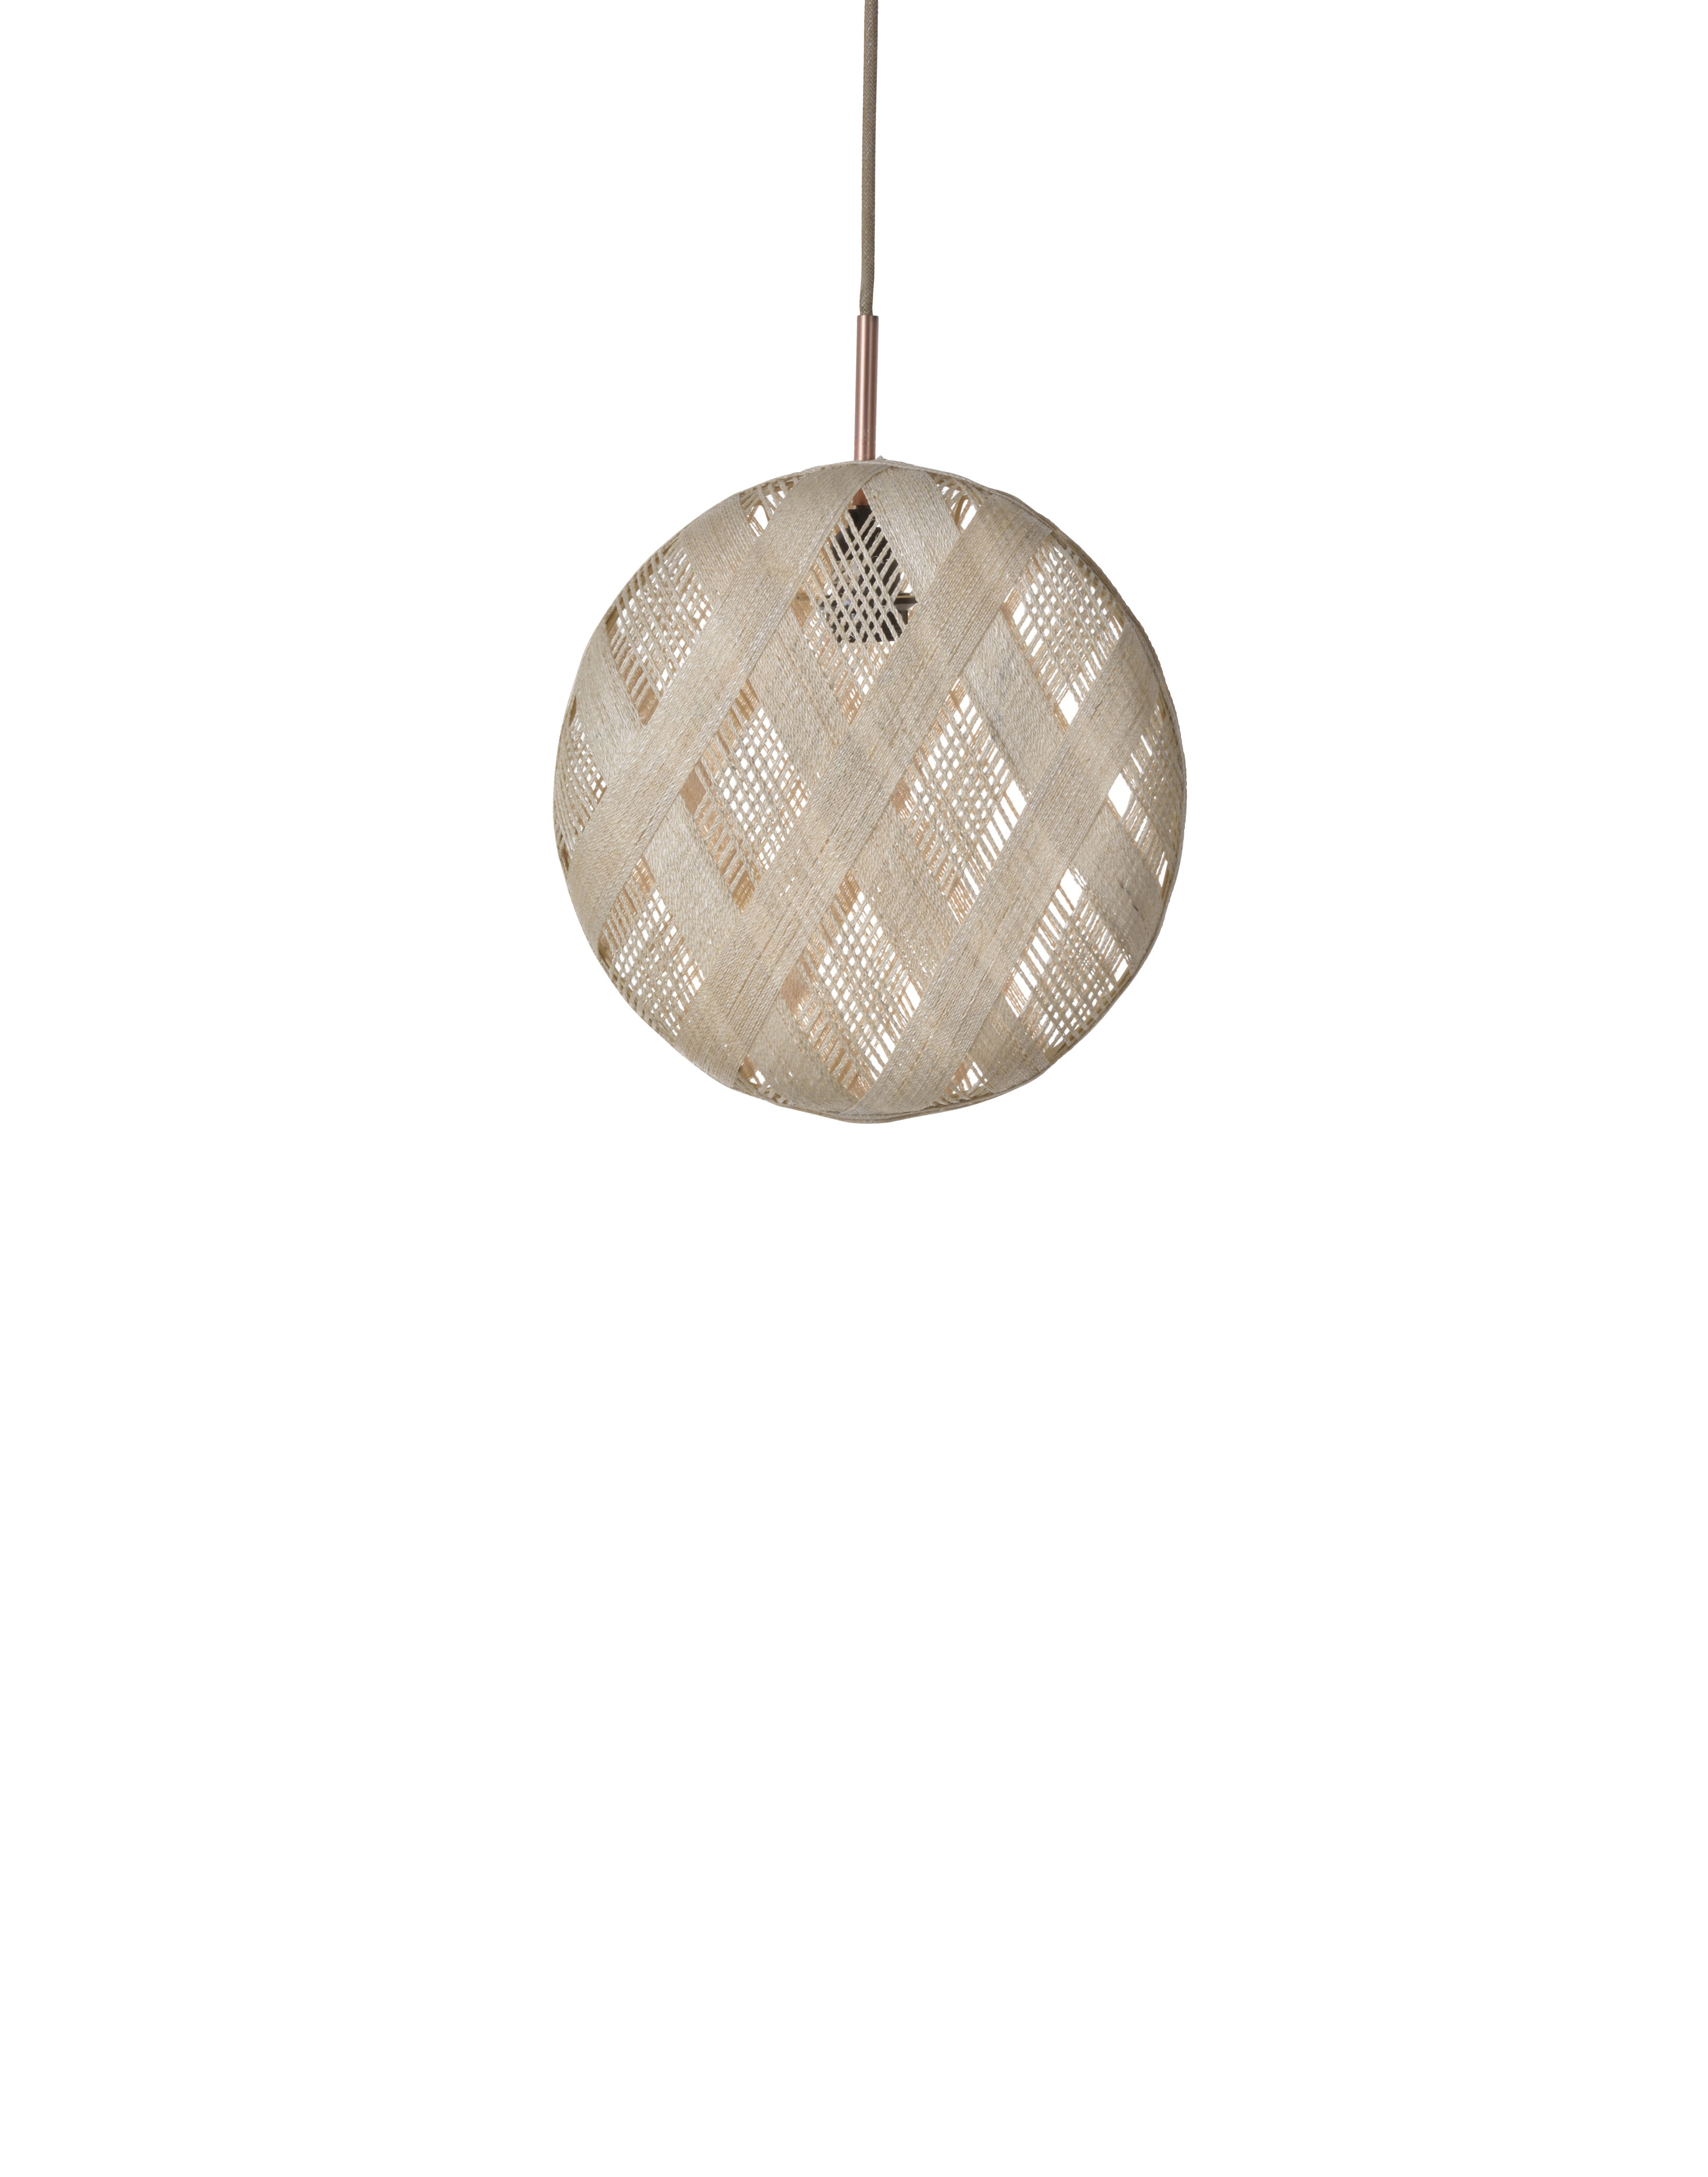 Lighting - Pendant Lighting - Chanpen Diamond Pendant - Ø  19 cm by Forestier - Natural / Diamond patterns - Woven acaba